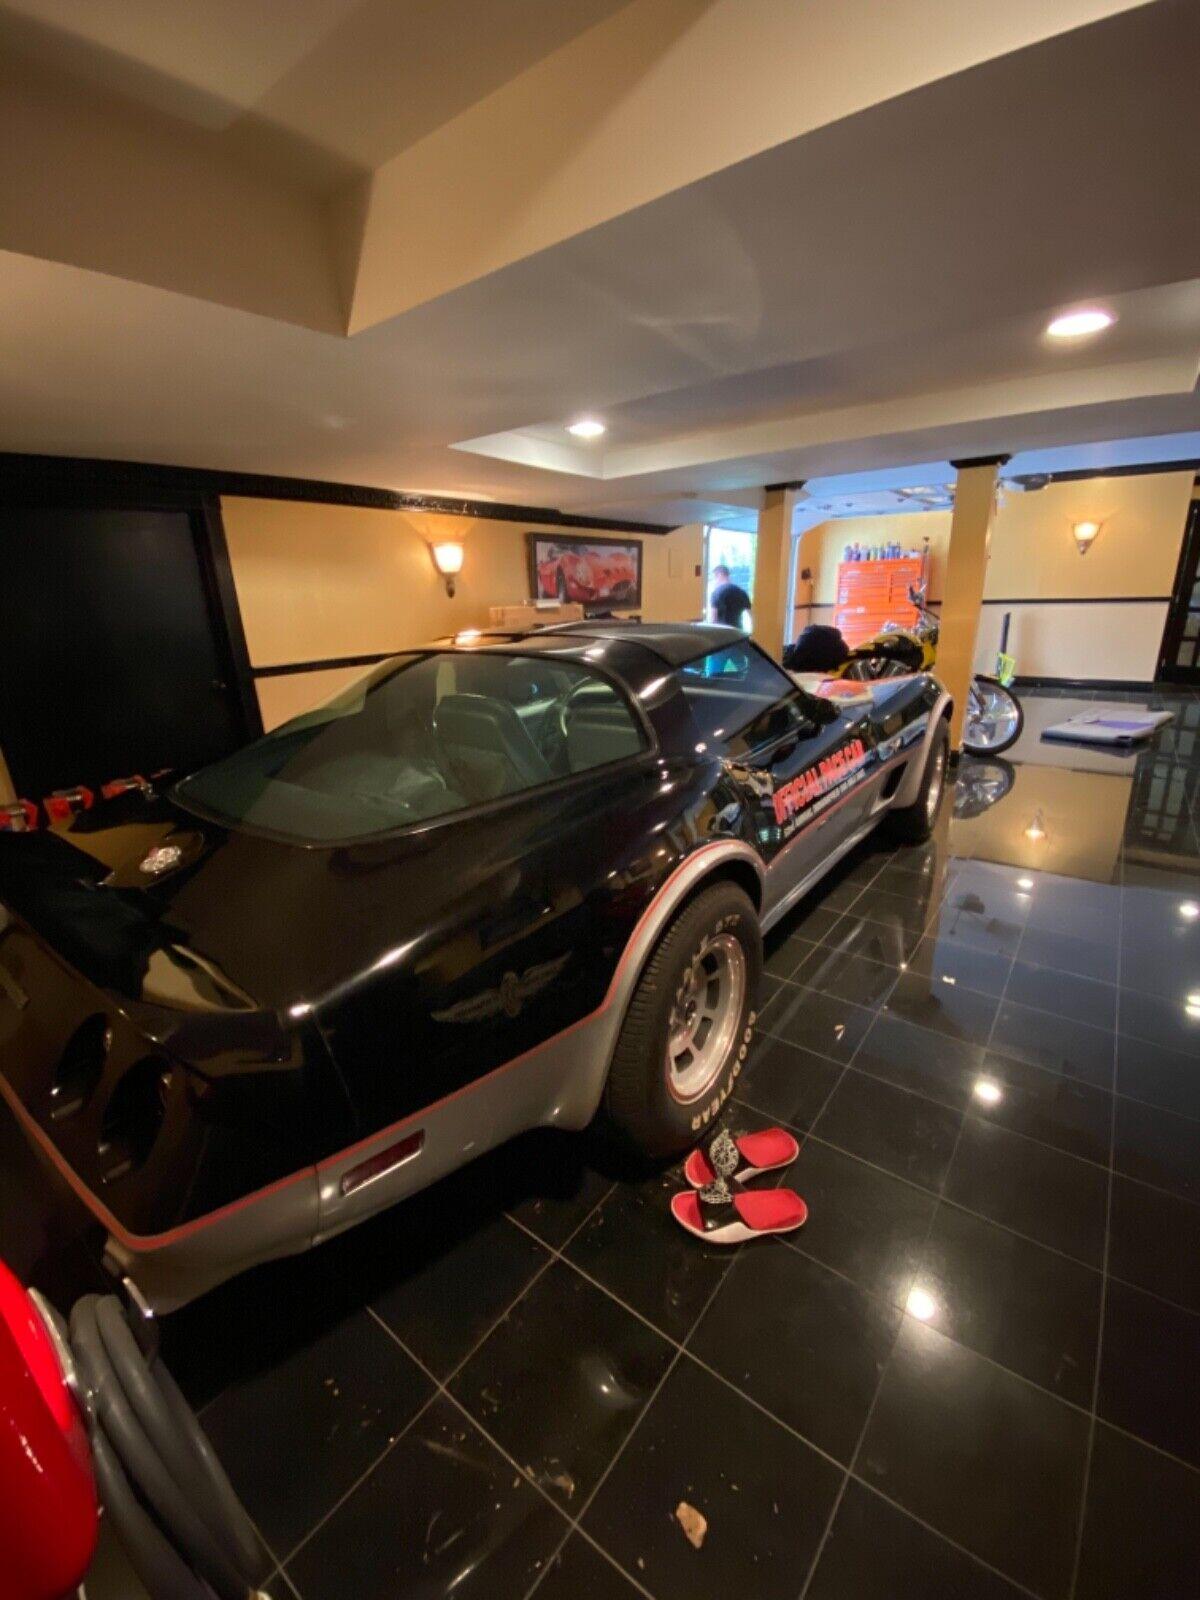 1978 Black Chevrolet Corvette   | C3 Corvette Photo 5